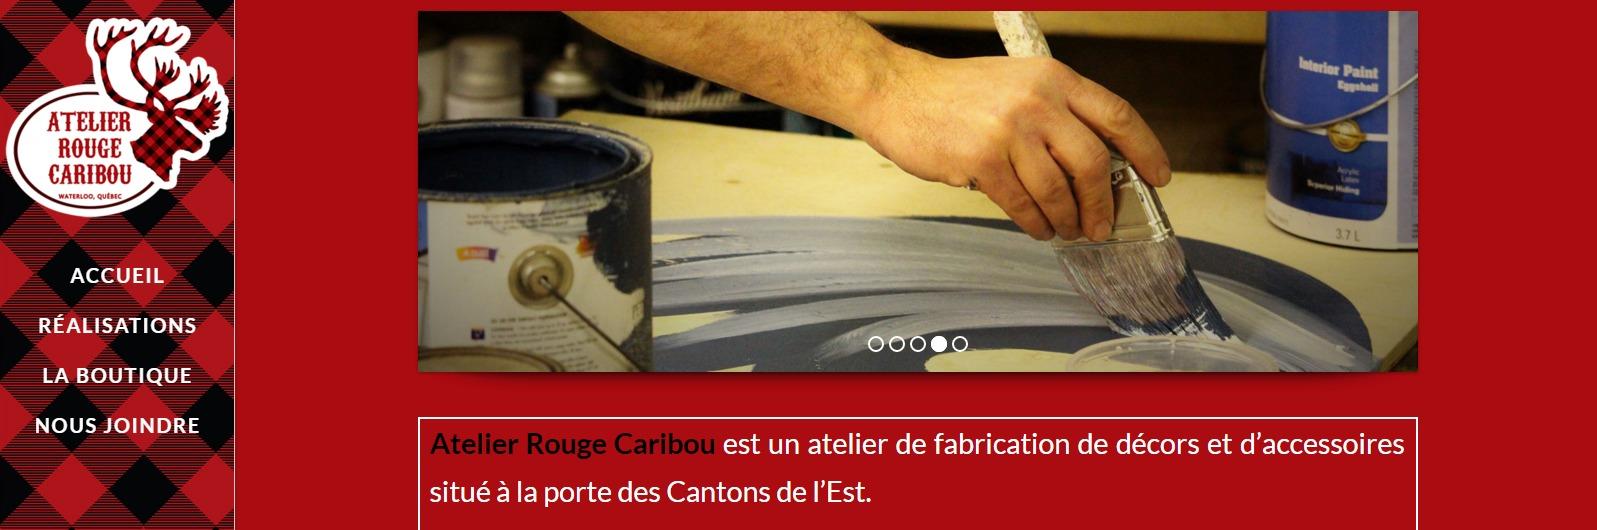 Accueil Atelier Rouge Caribou